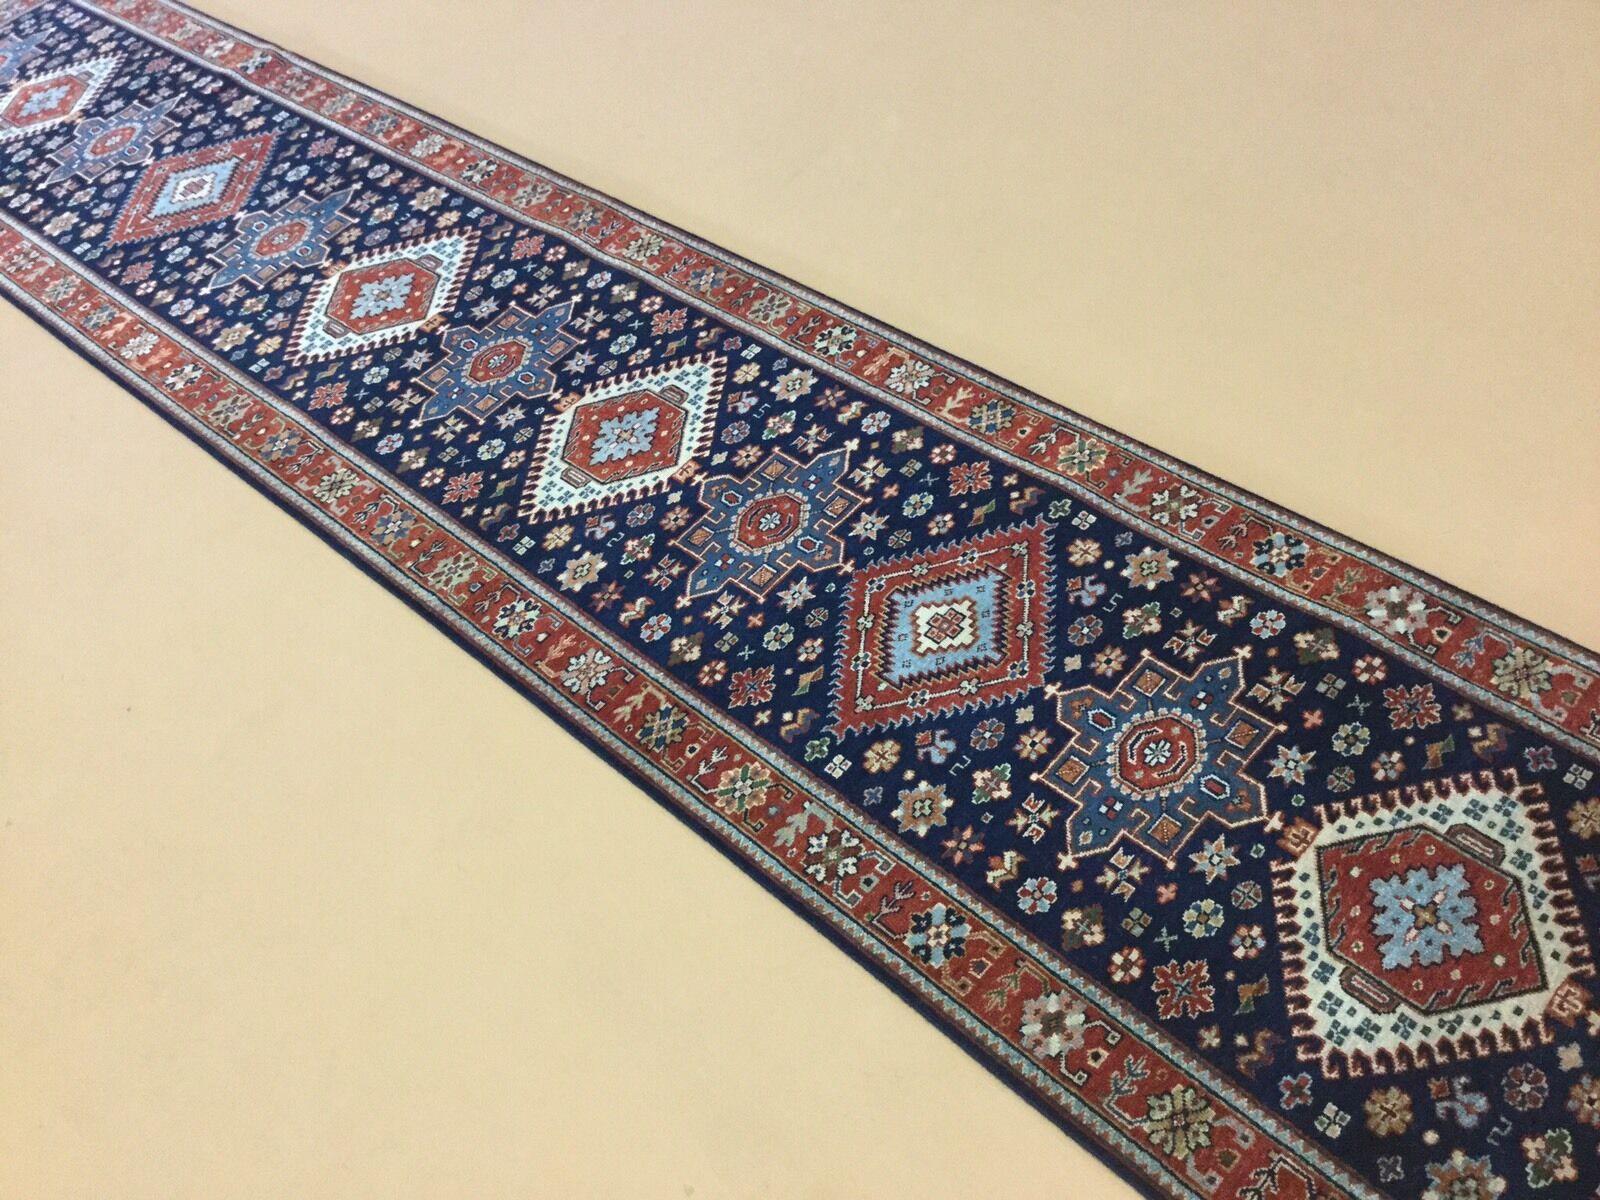 2'.6  X X X 13'.6  Navy Blau Karajeh Persian Oriental Rug Long Runner Hand Knotted beb291